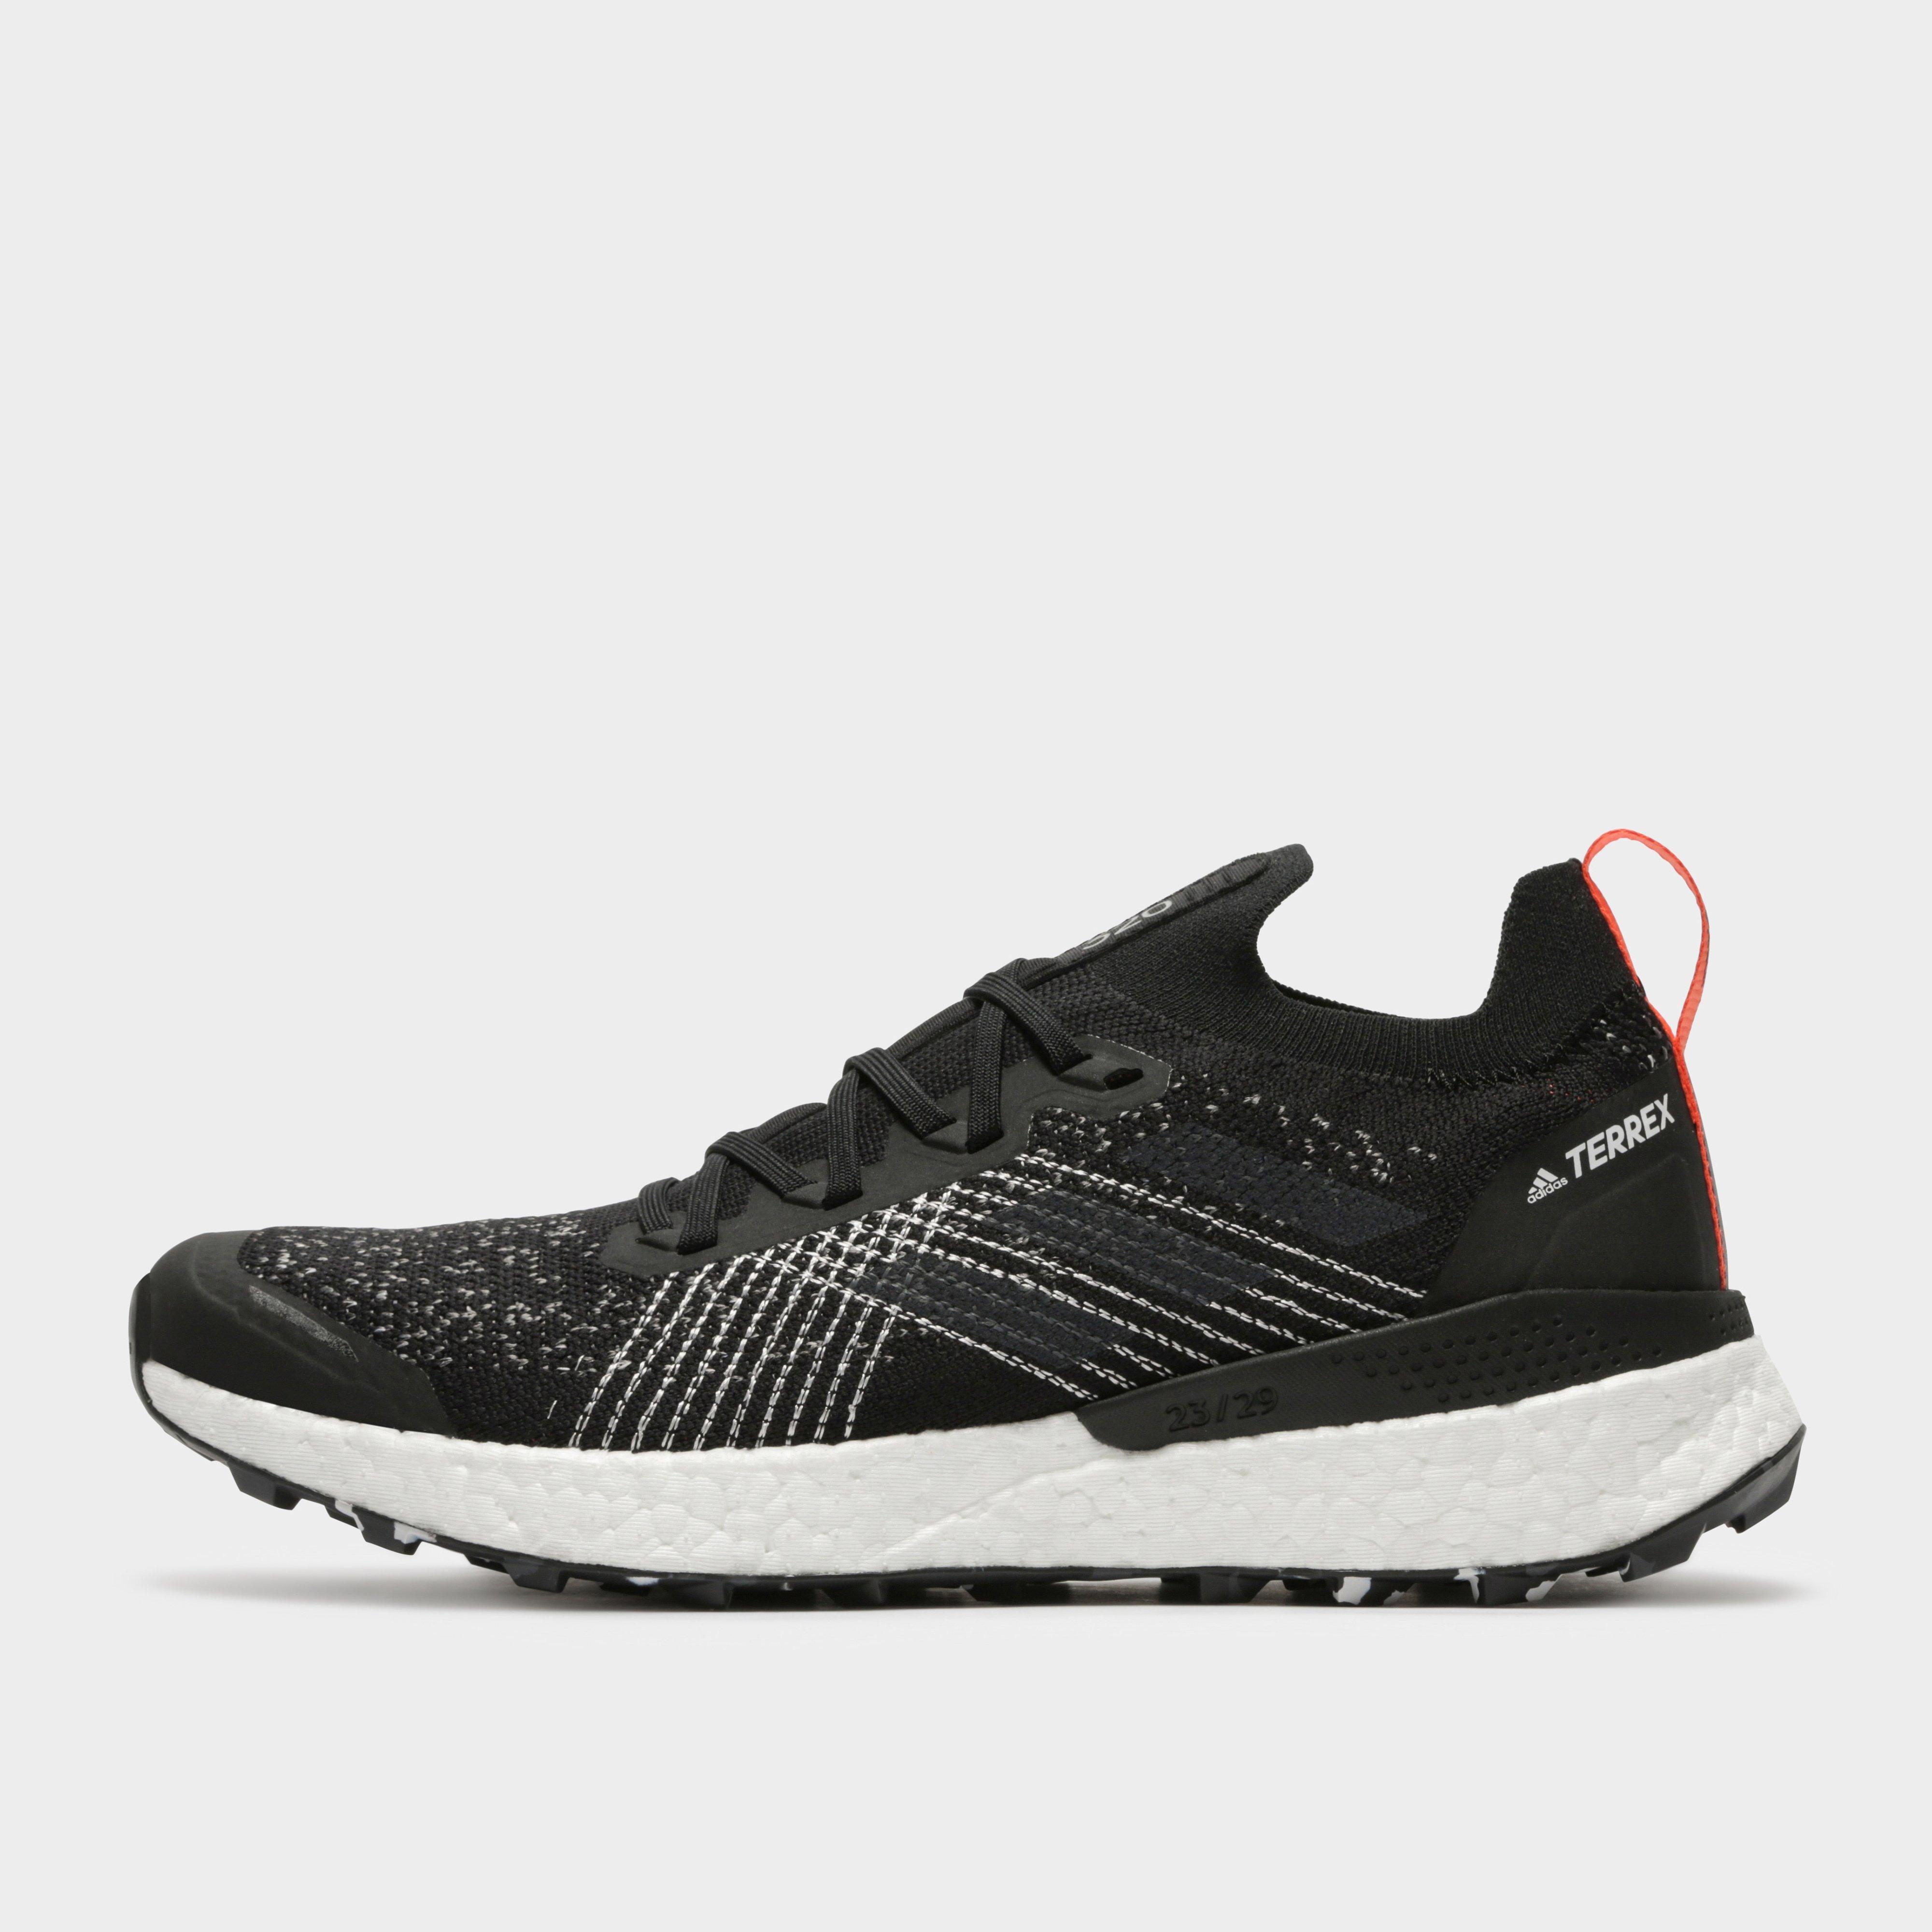 adidas | Terrex Two Parley Trail Running Shoe | Nordstrom Rack